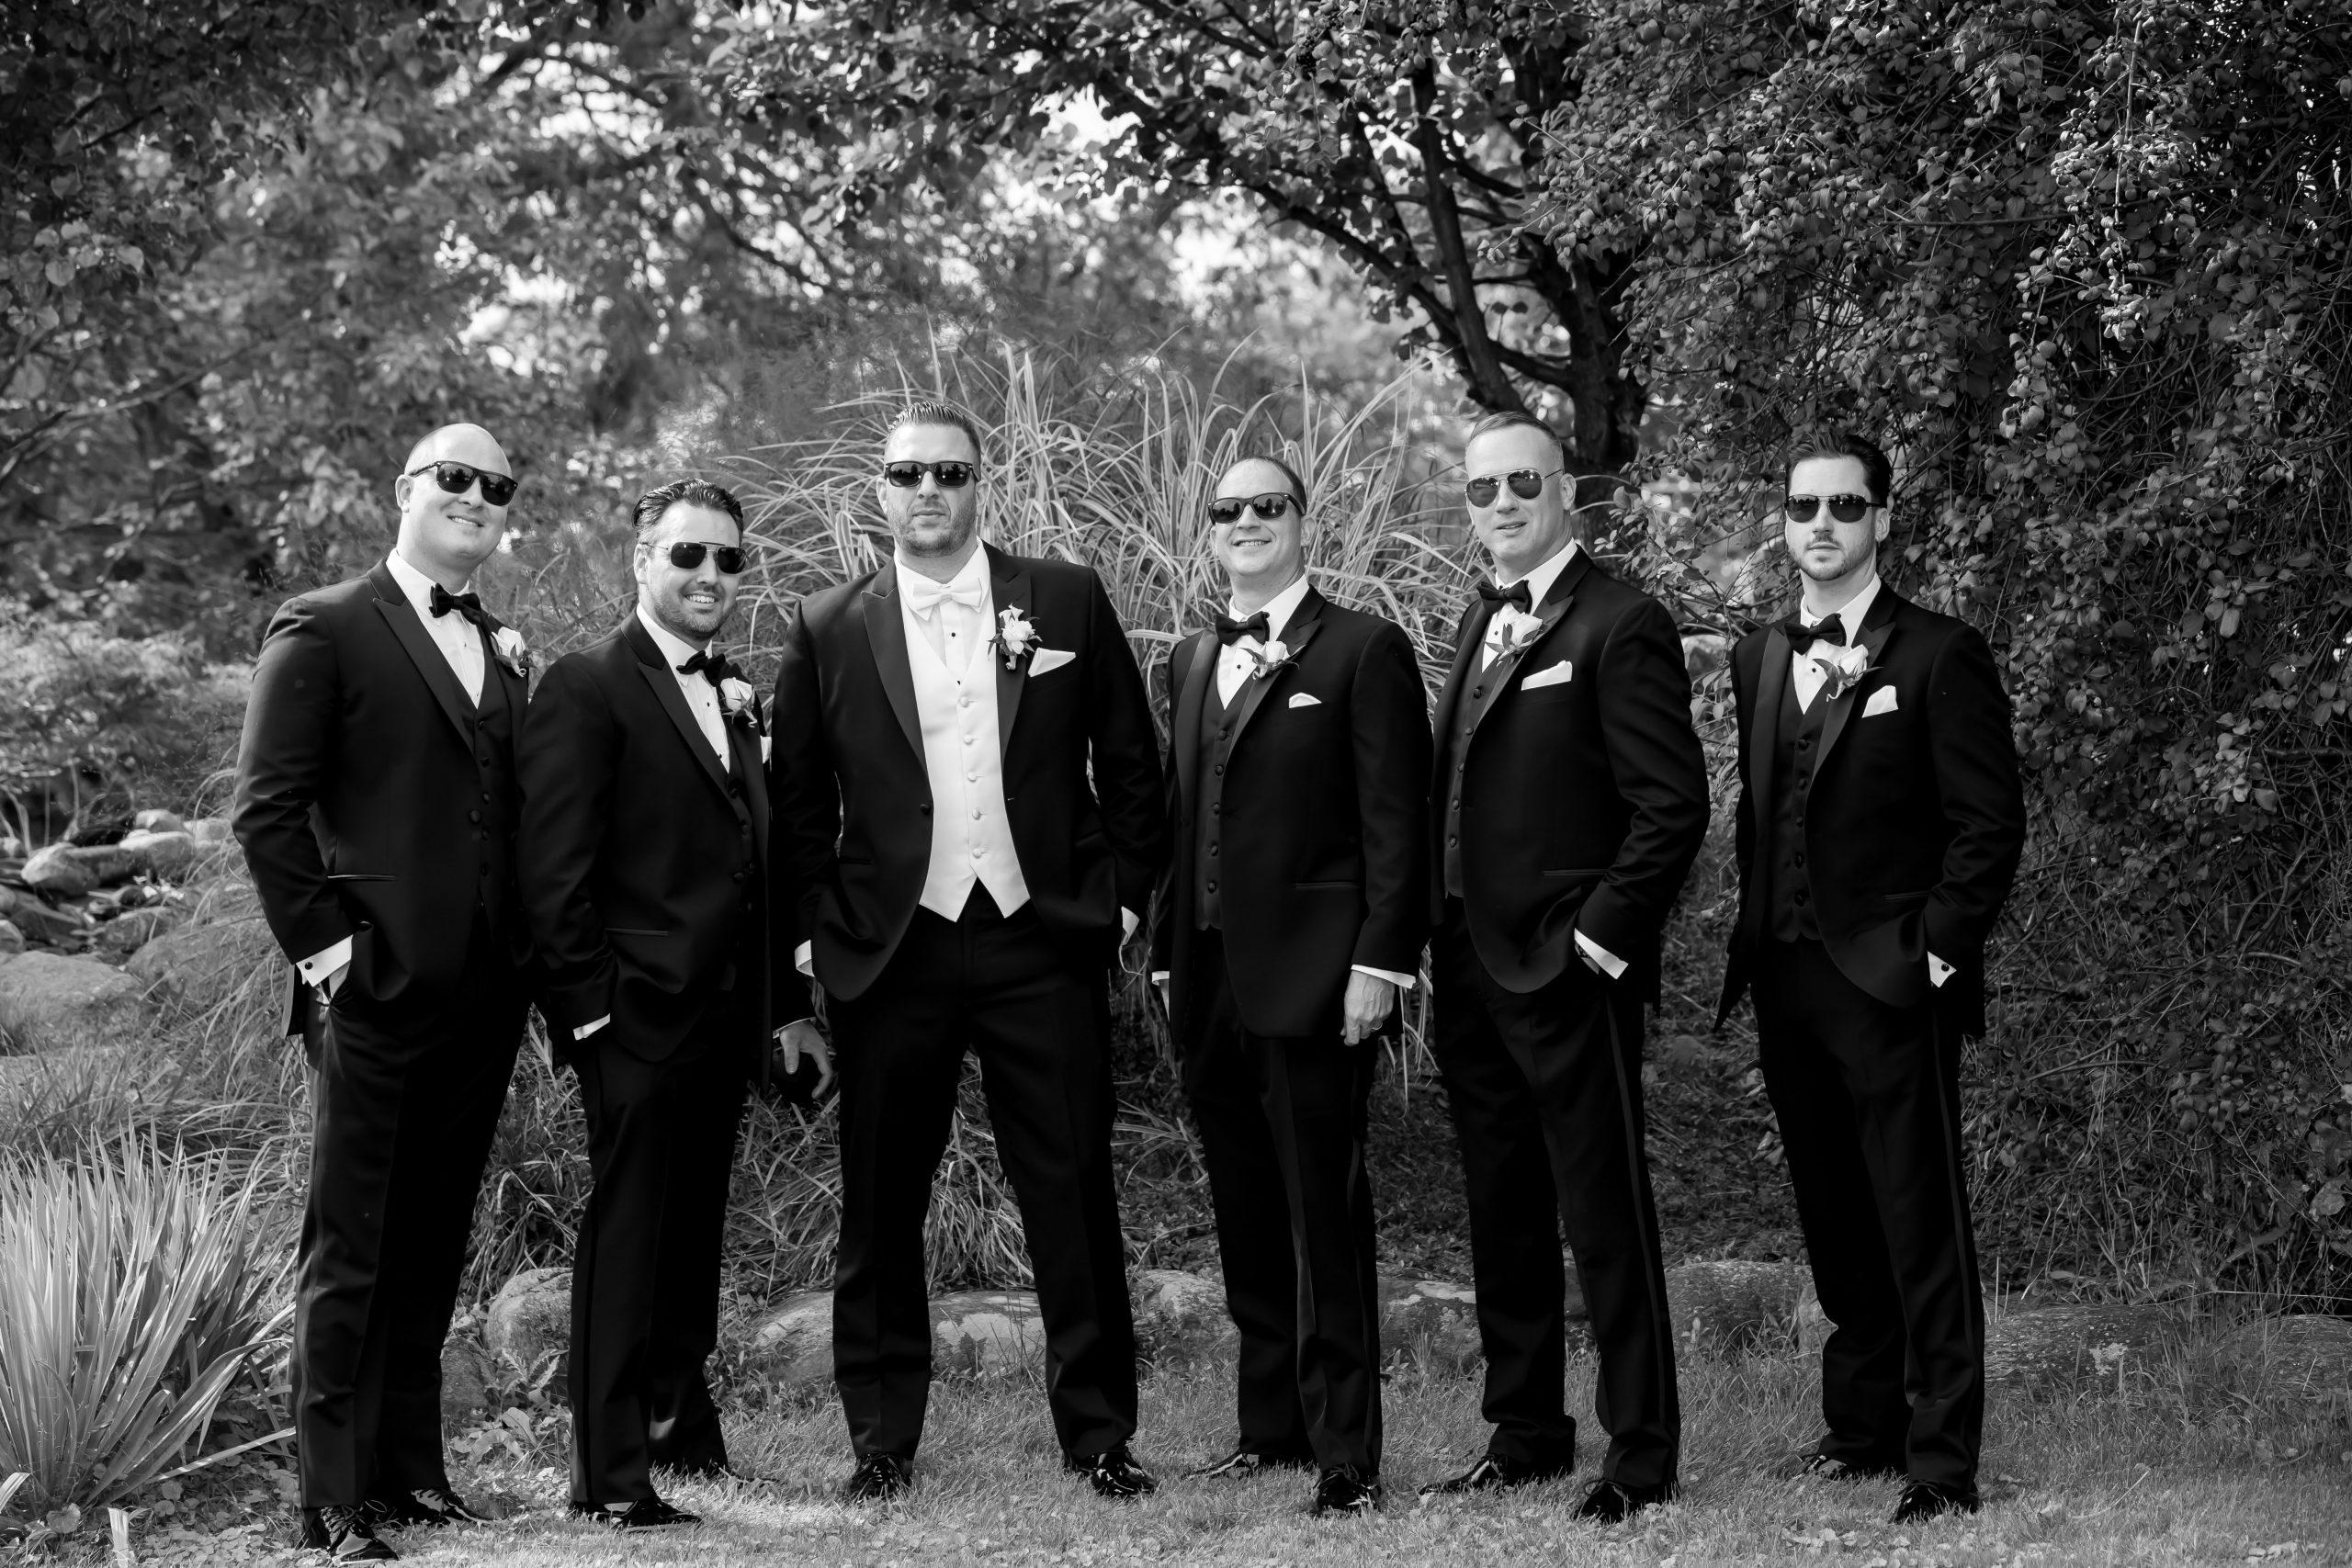 Victori_Rob_Mohawk River Country Club Wedding-15.jpg